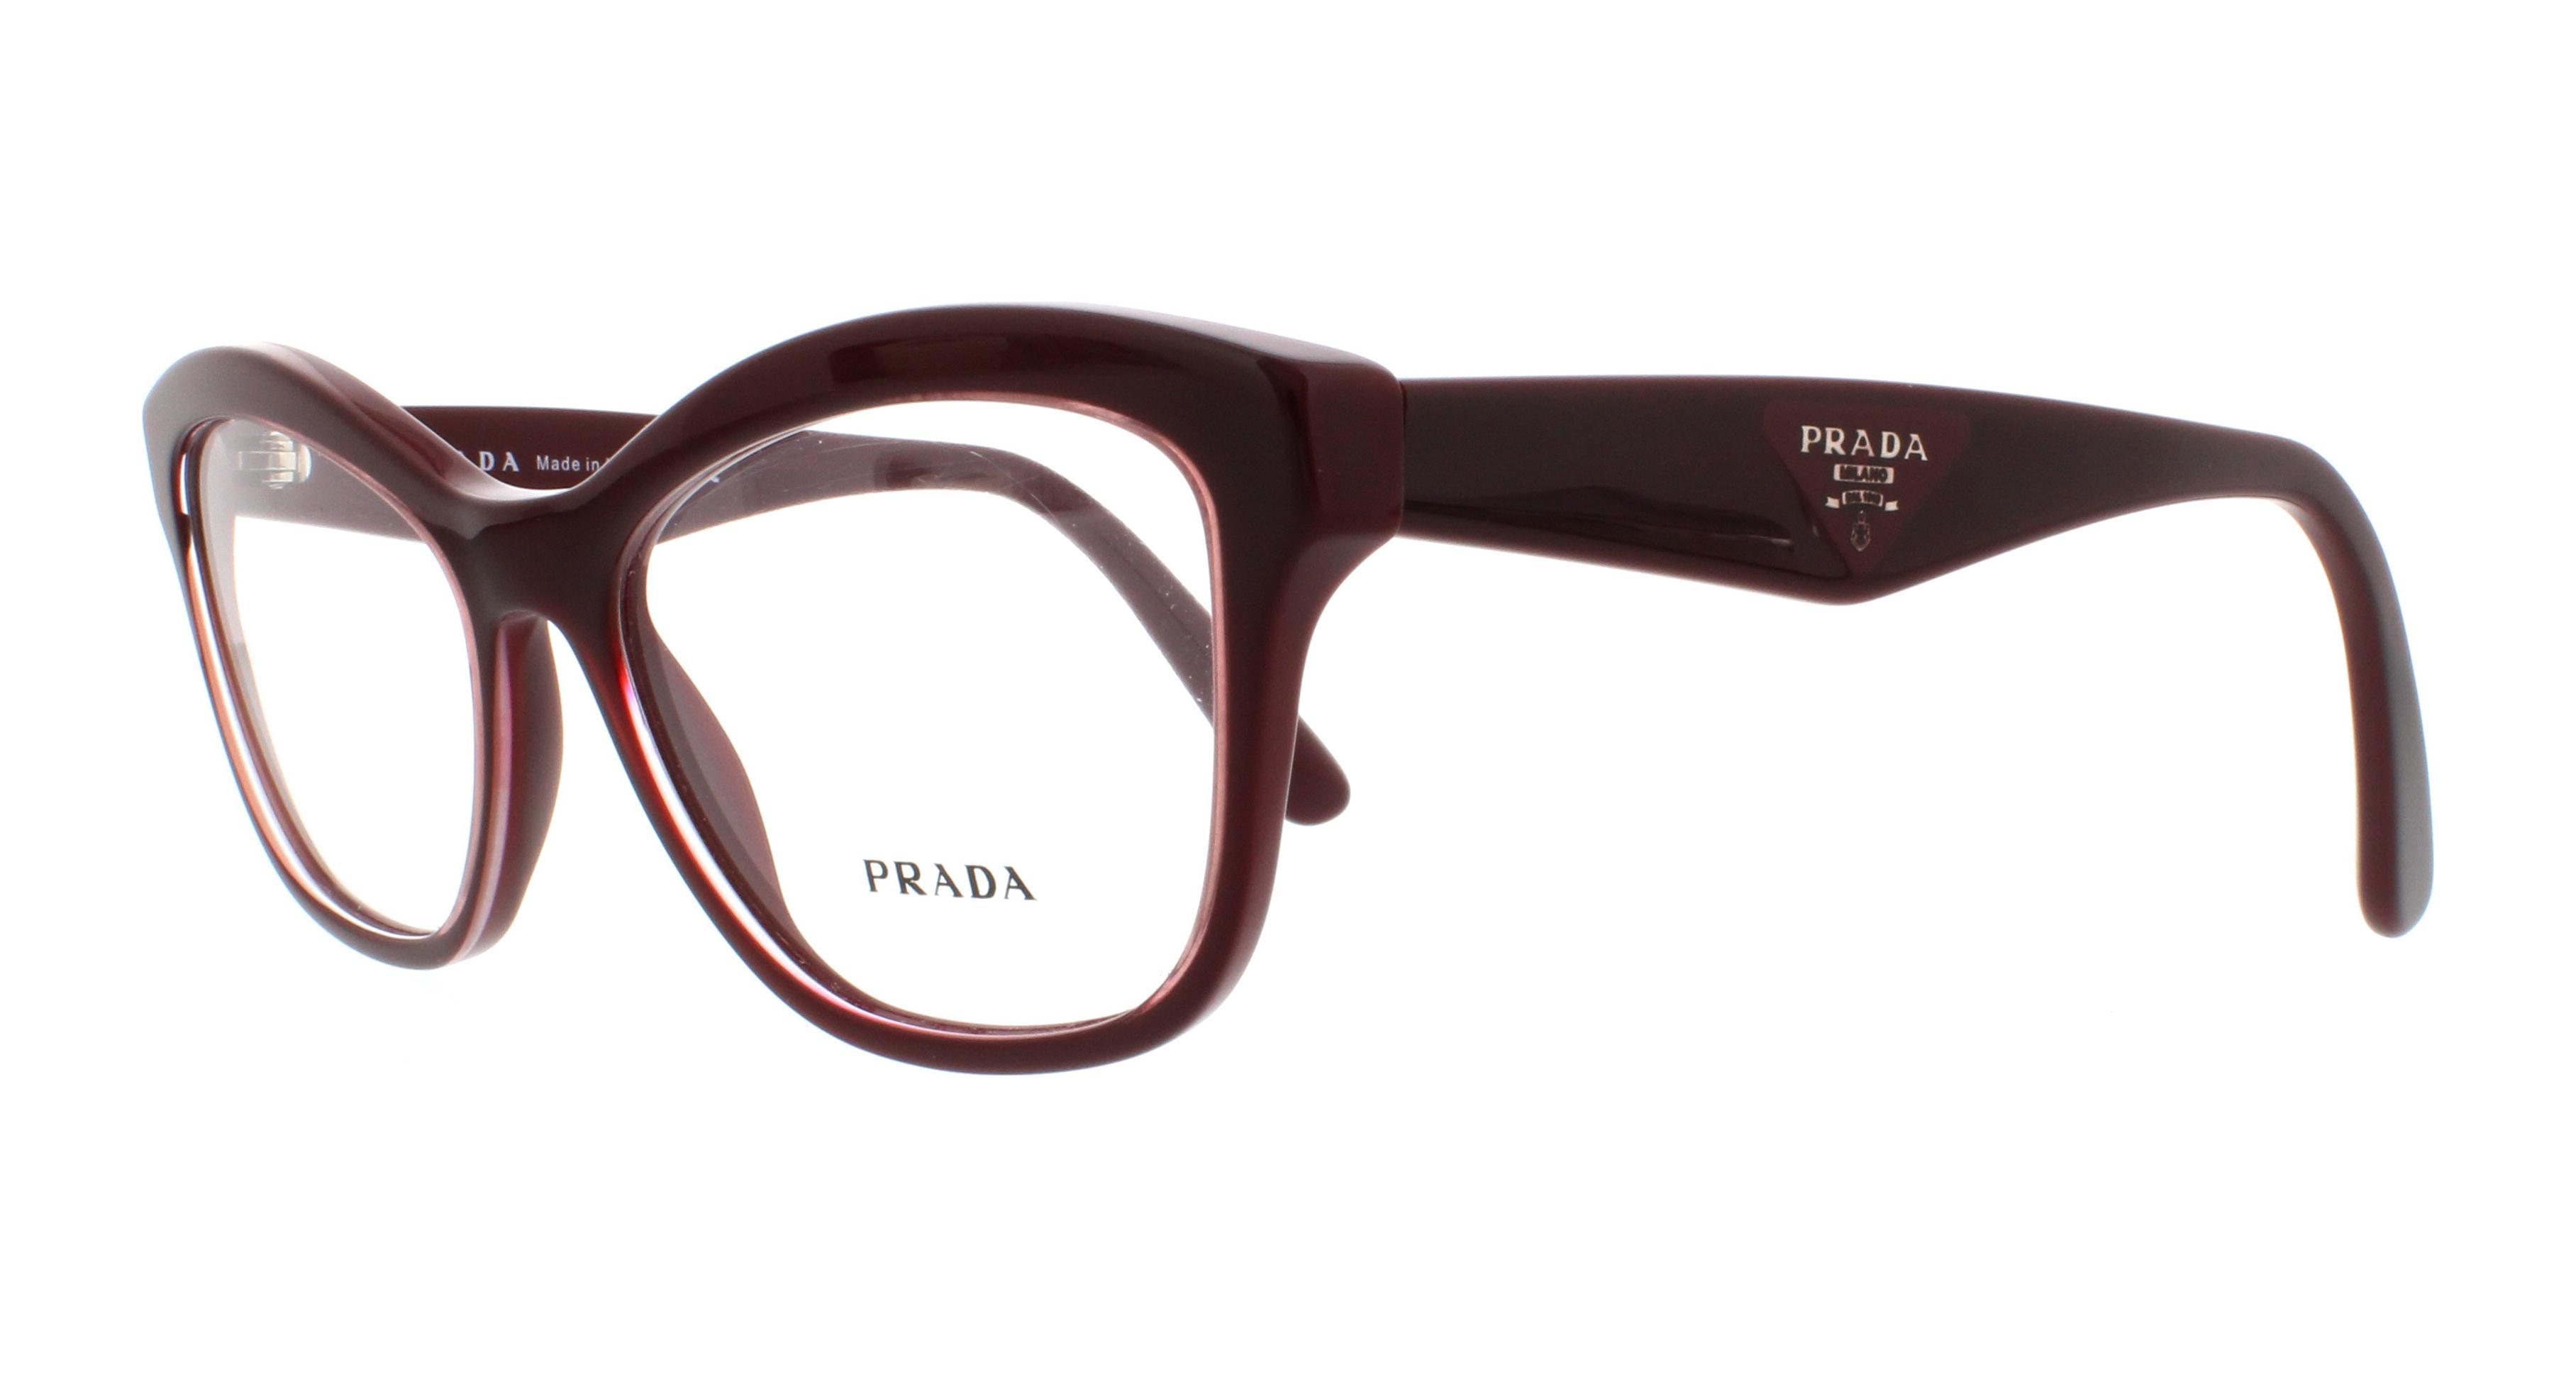 e34817981f Designer Eyeglasses Frames Outlet - Bitterroot Public Library